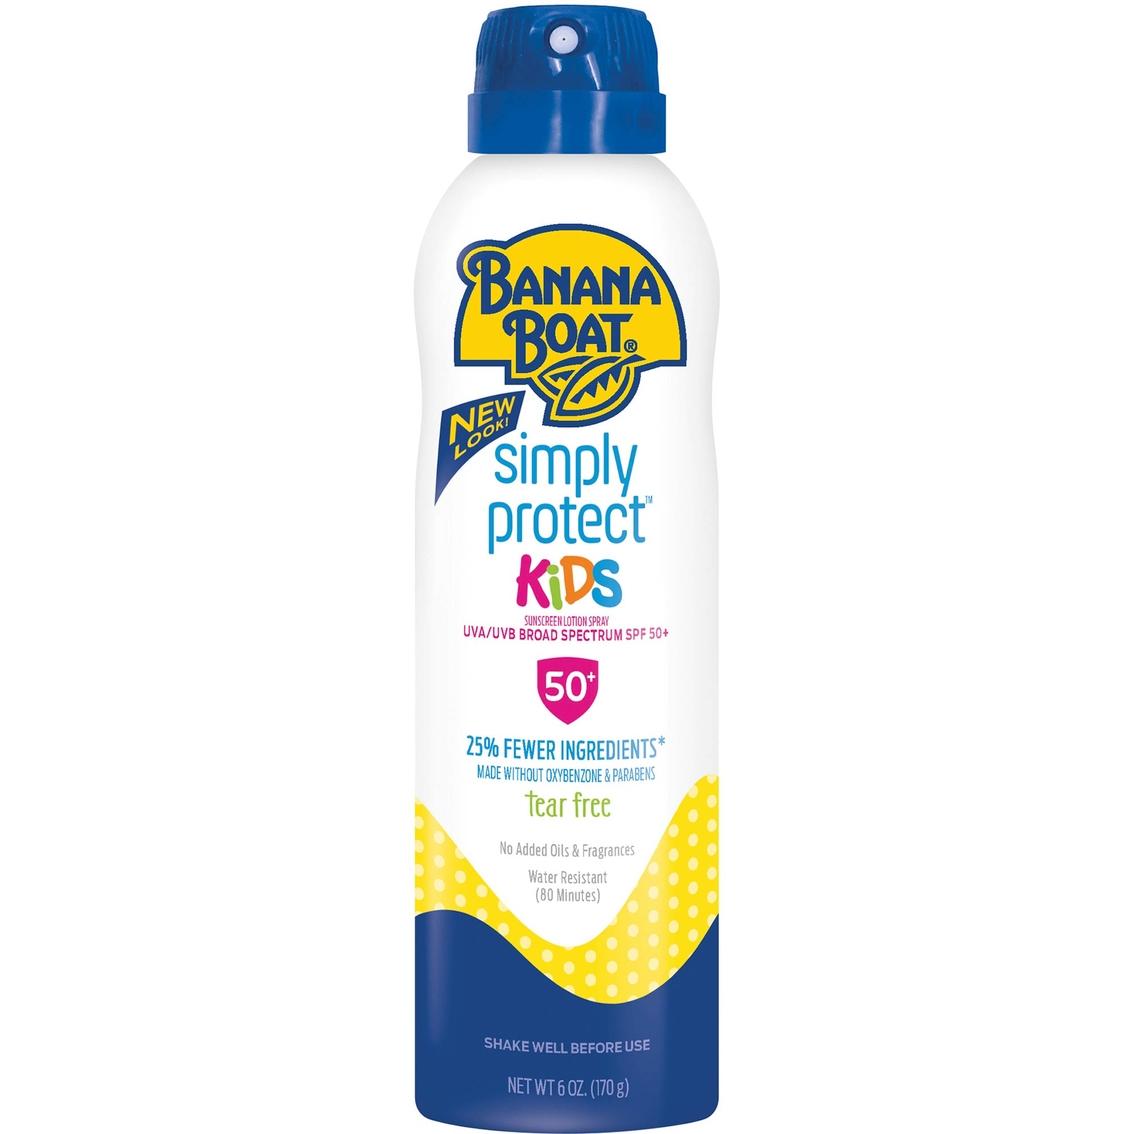 Banana Boat Simply Protect Kids Spf 50 Sunscreen C Spray